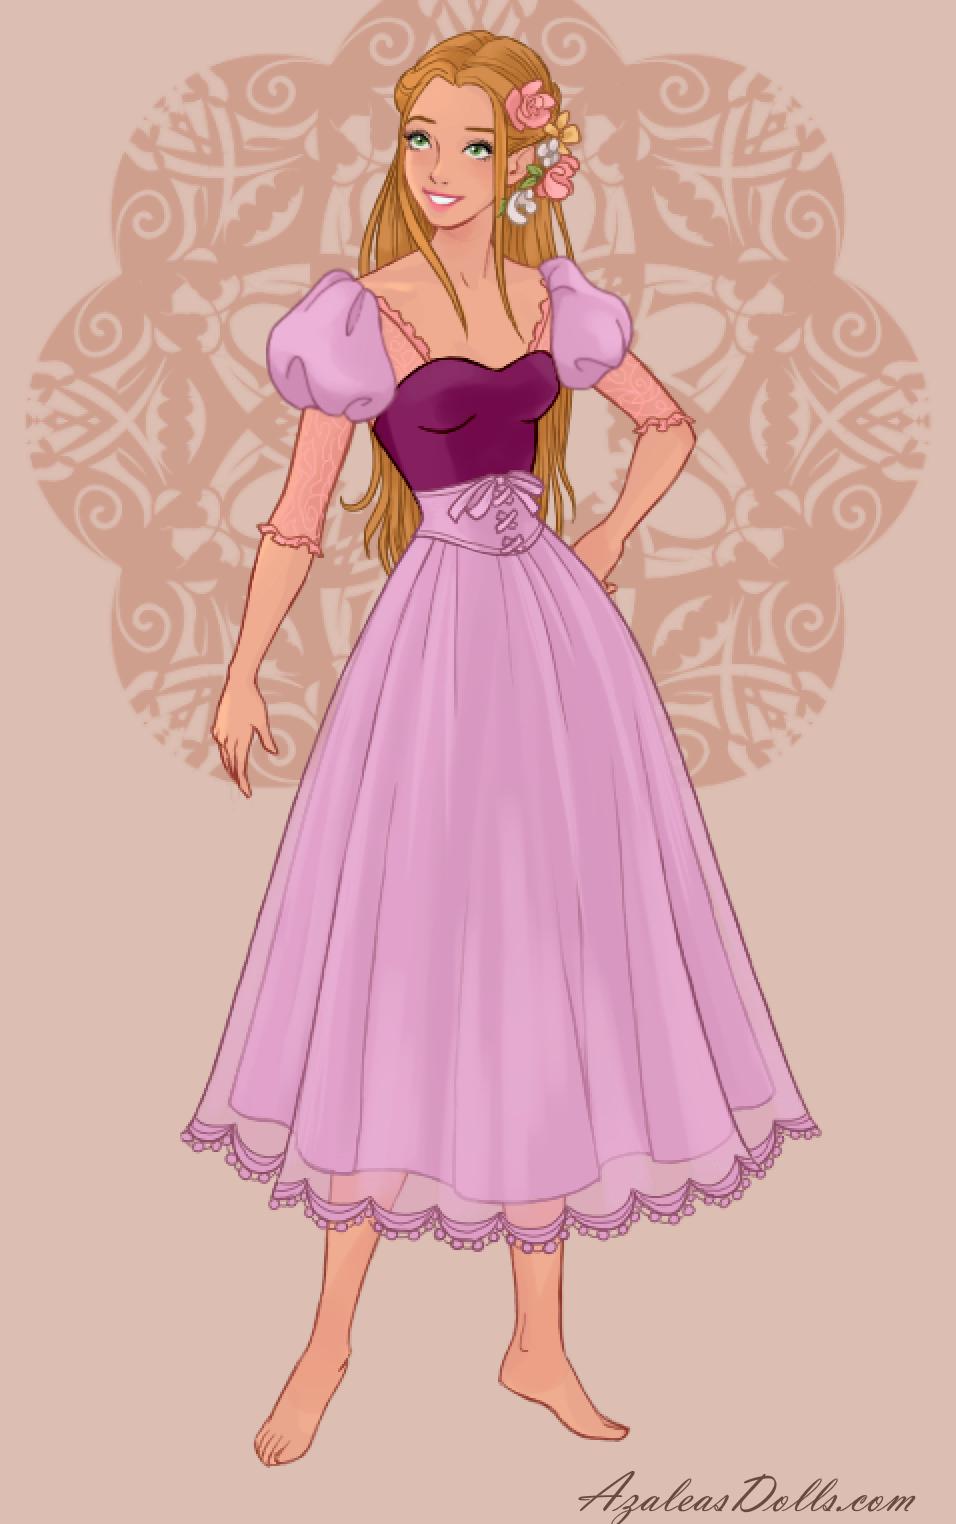 Rapunzel In Wedding Dress Design Dress Up Game Designer Wedding Dresses Rapunzel Designer Dresses